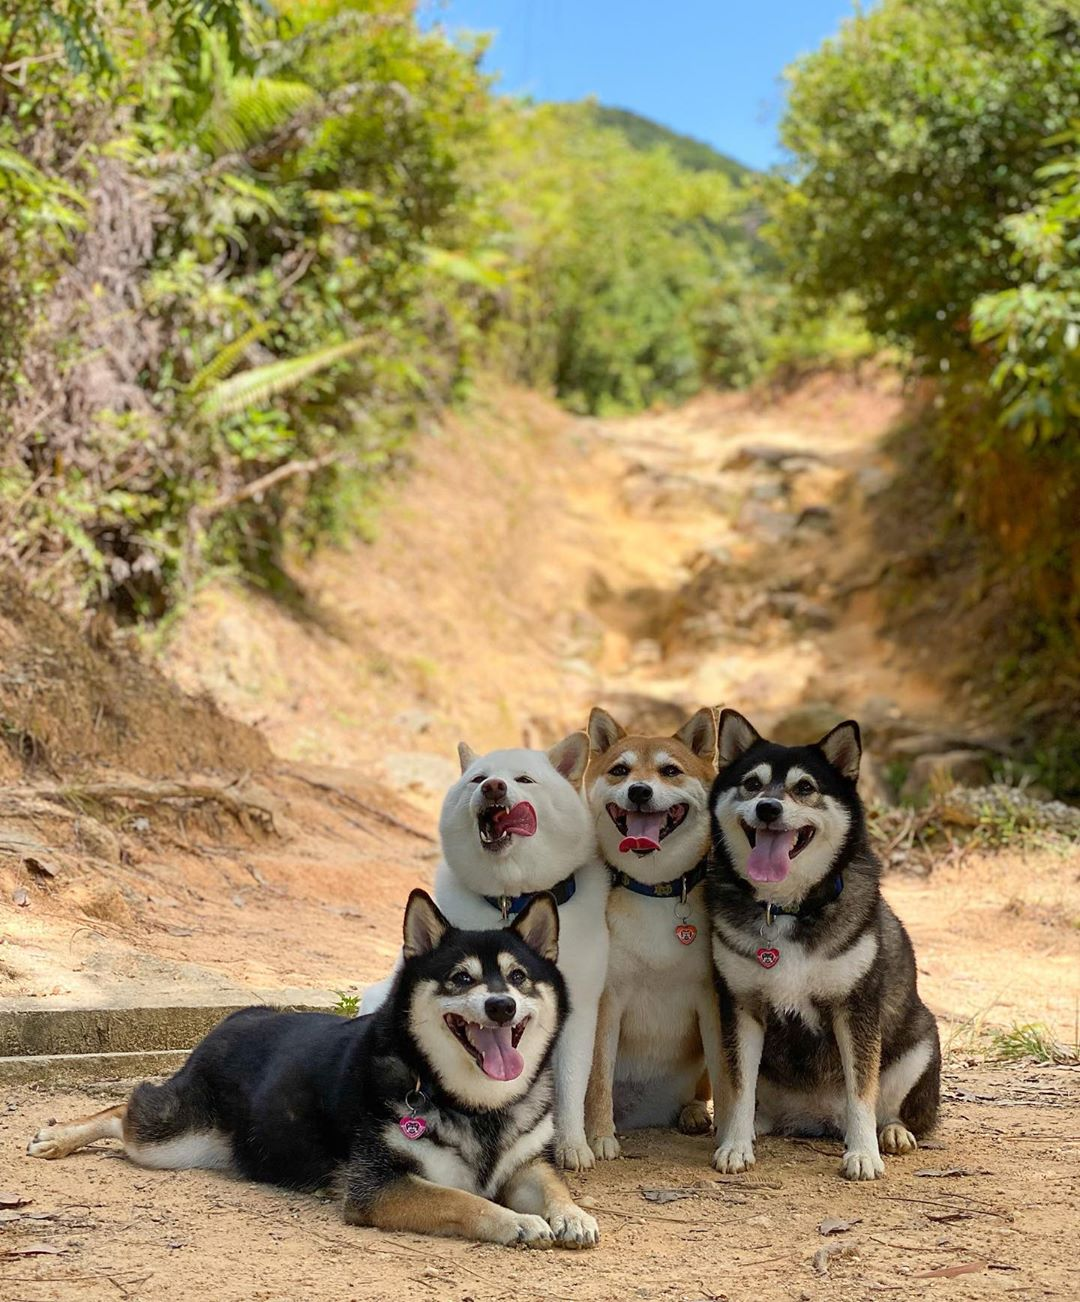 Unphotogenic doggo